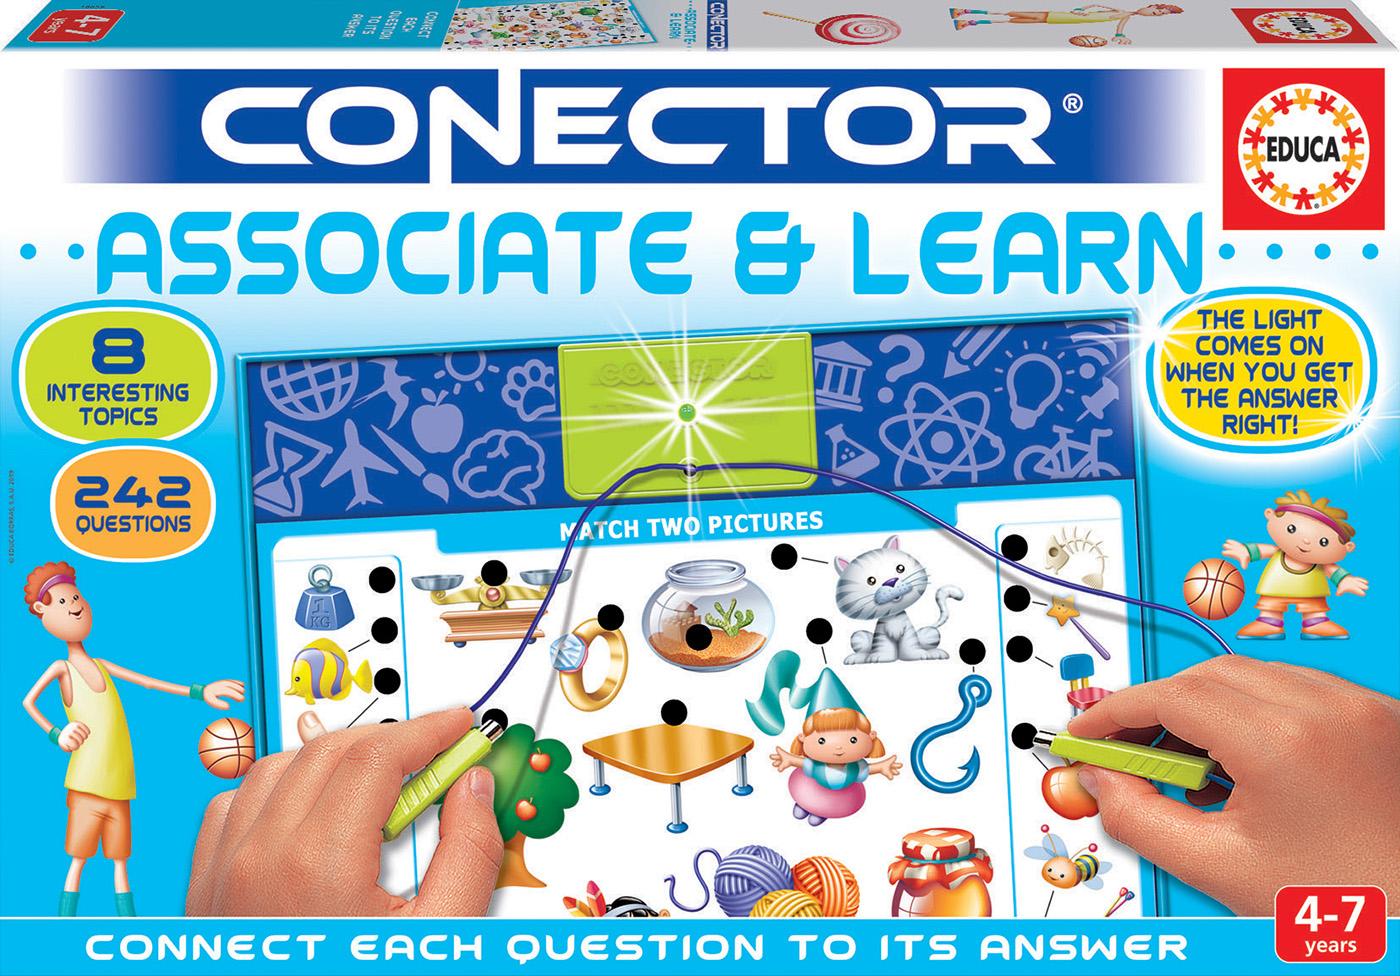 Conector Associate & Learn